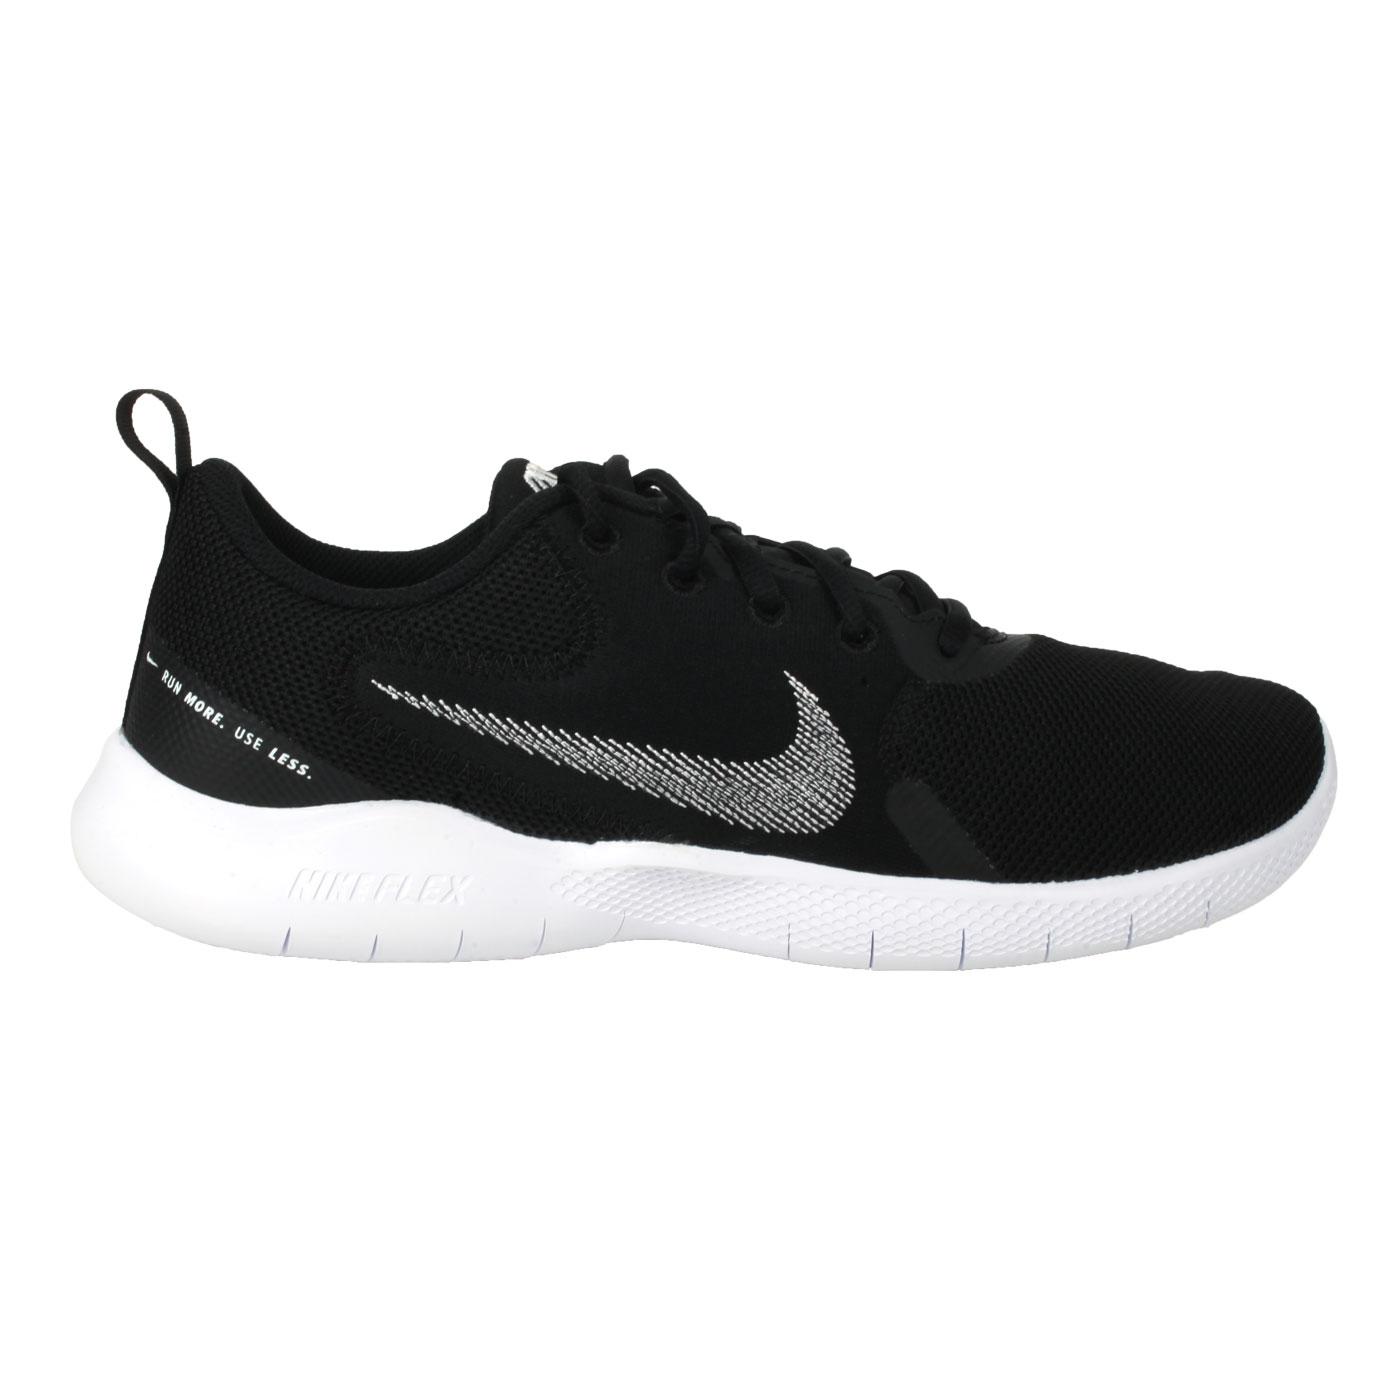 NIKE 男款運動鞋  @FLEX EXPERIENCE RN 10@CI9960002 - 黑白